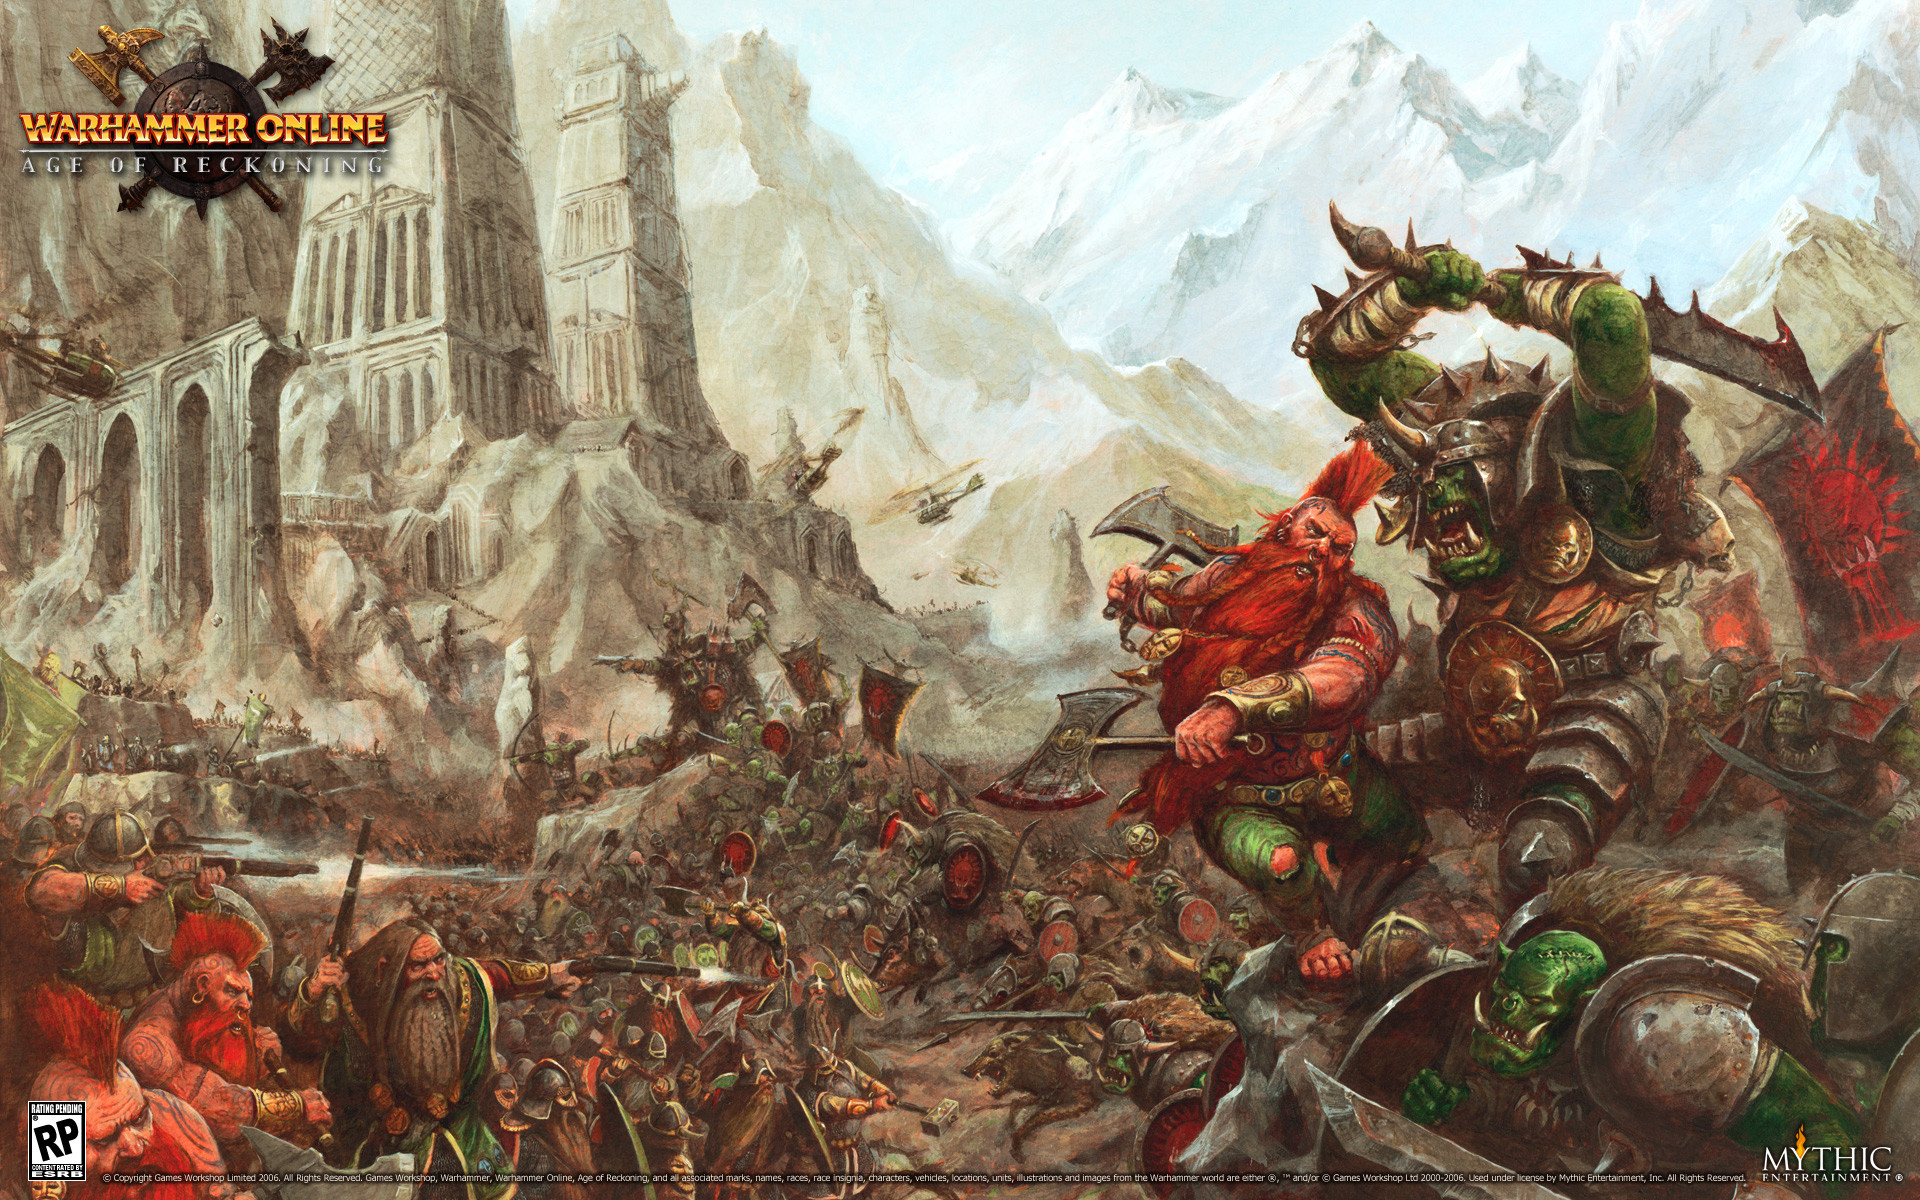 Res: 1920x1200, Video Game - Warhammer Dwarf Orc Weapon Warhammer Online: Age Of Reckoning  Wallpaper